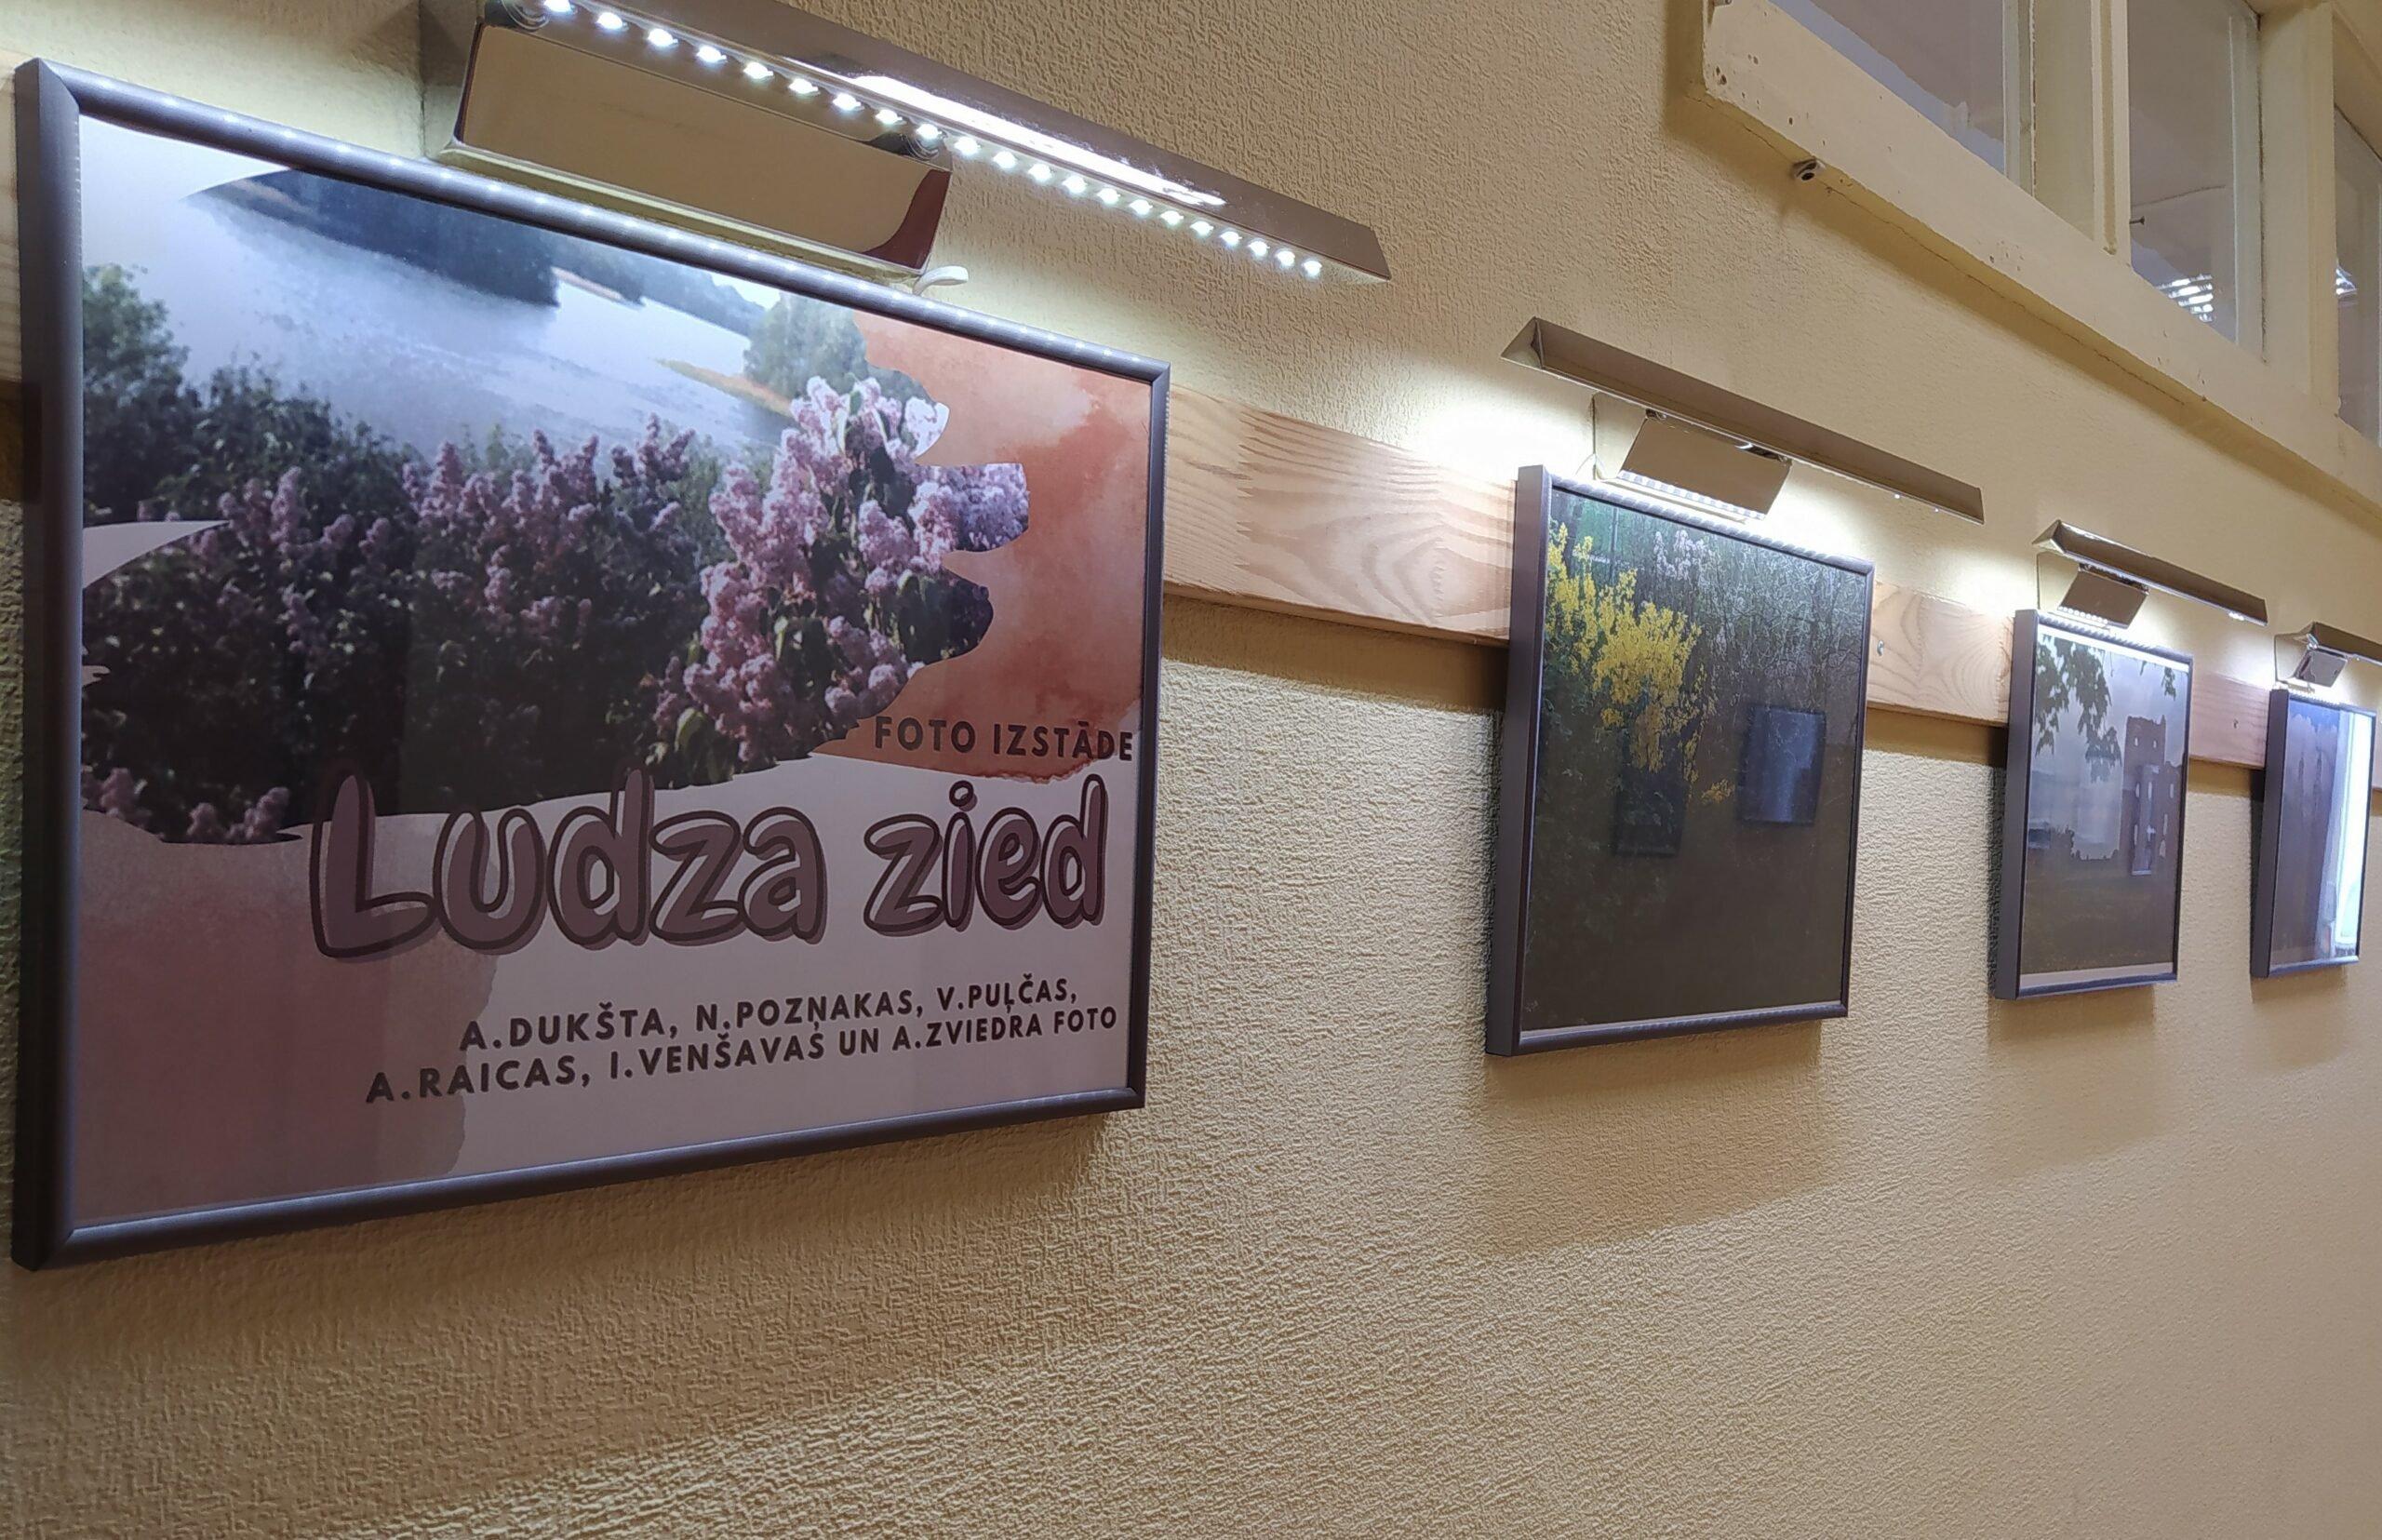 "Foto izstāde ""Ludza zied"""